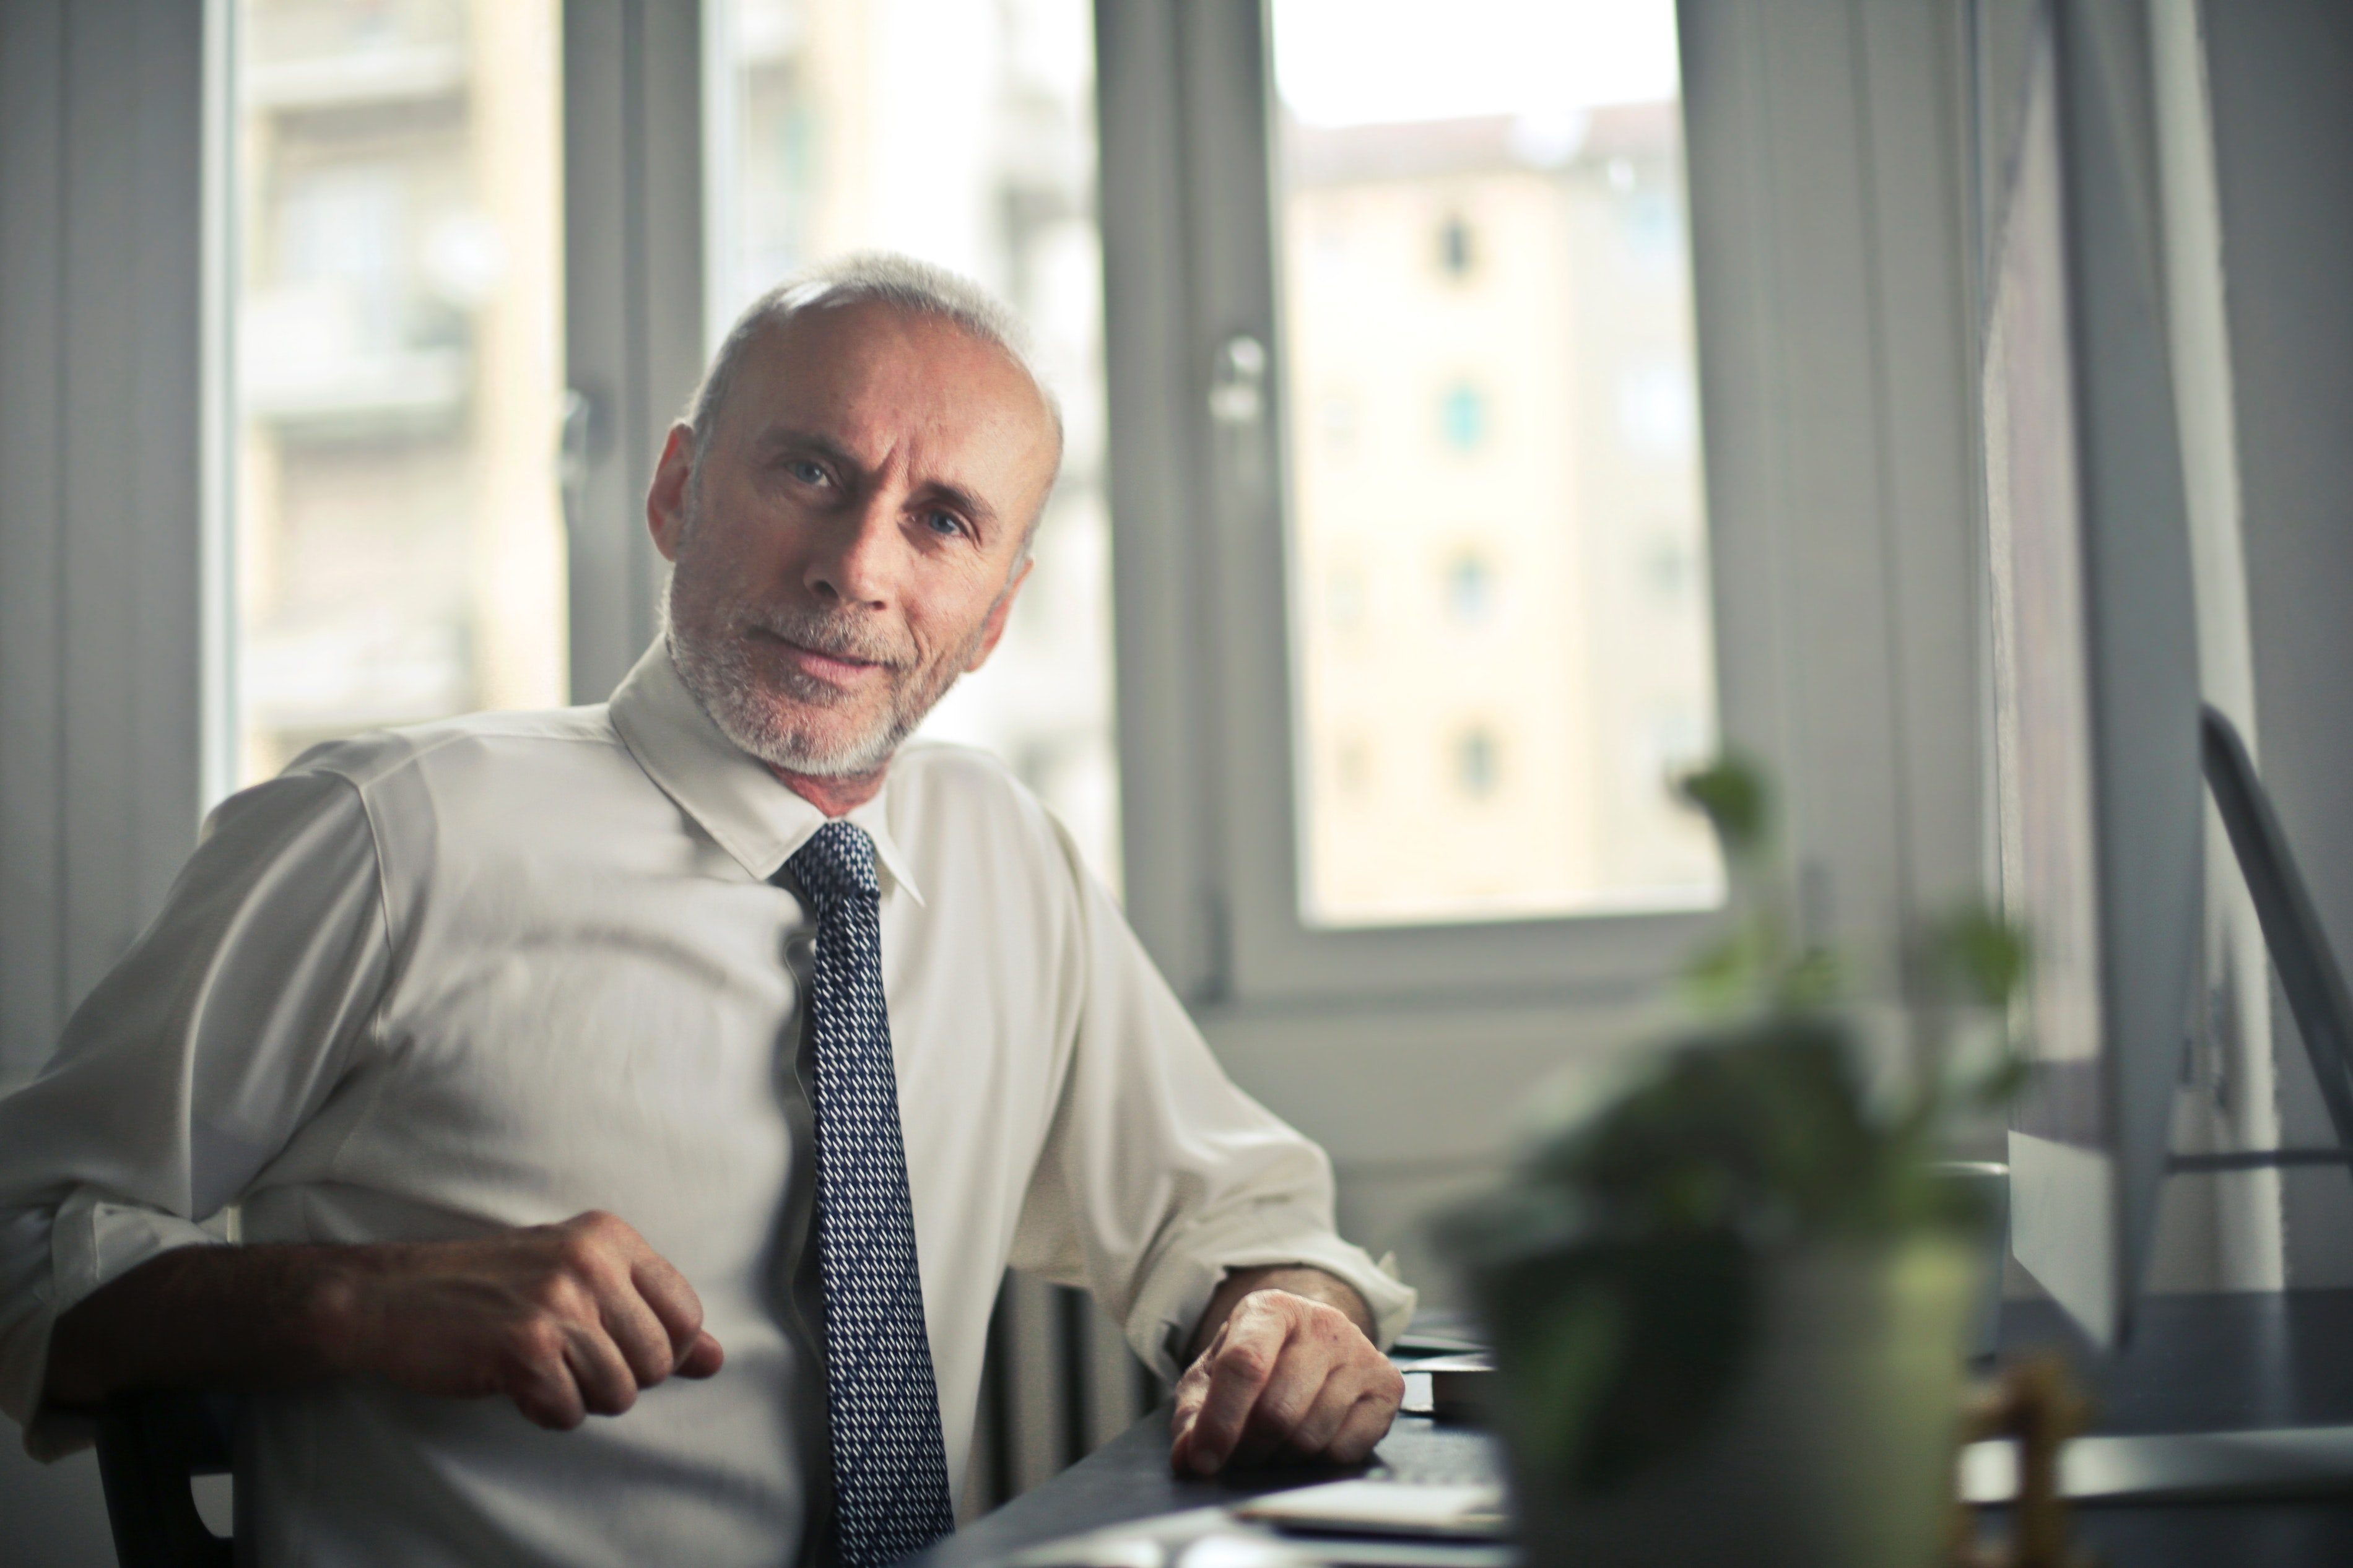 retiring solicitor